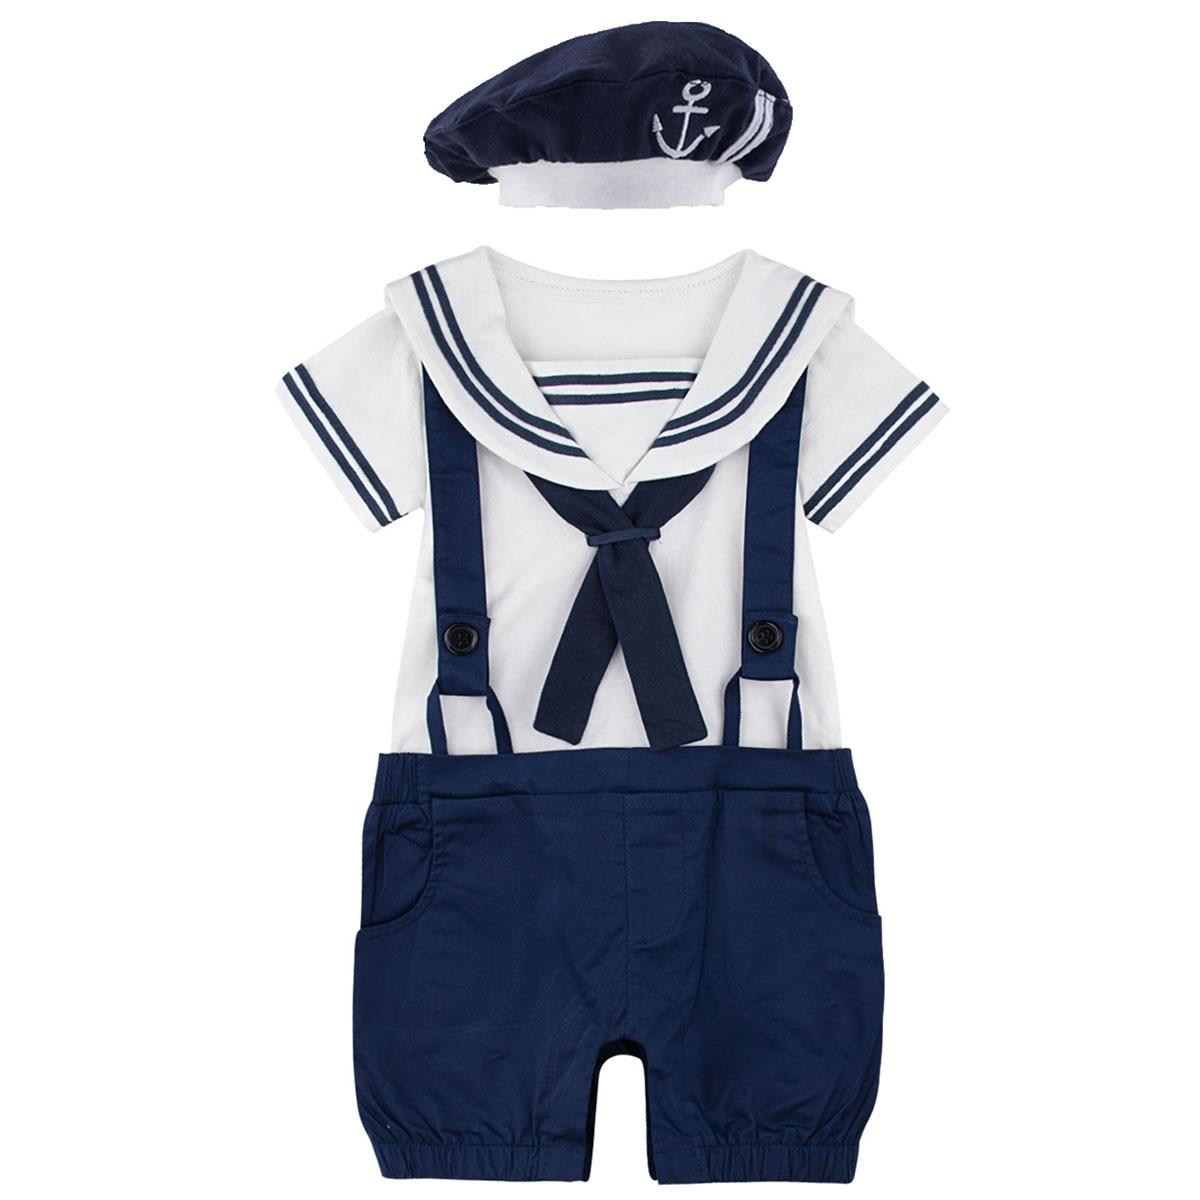 Newborn Baby Boys Girl Sailor Navy Style Romper Toddler Halloween 100% Cotton Suspender Jumpsuit Infant Braces with Hat Playsuit